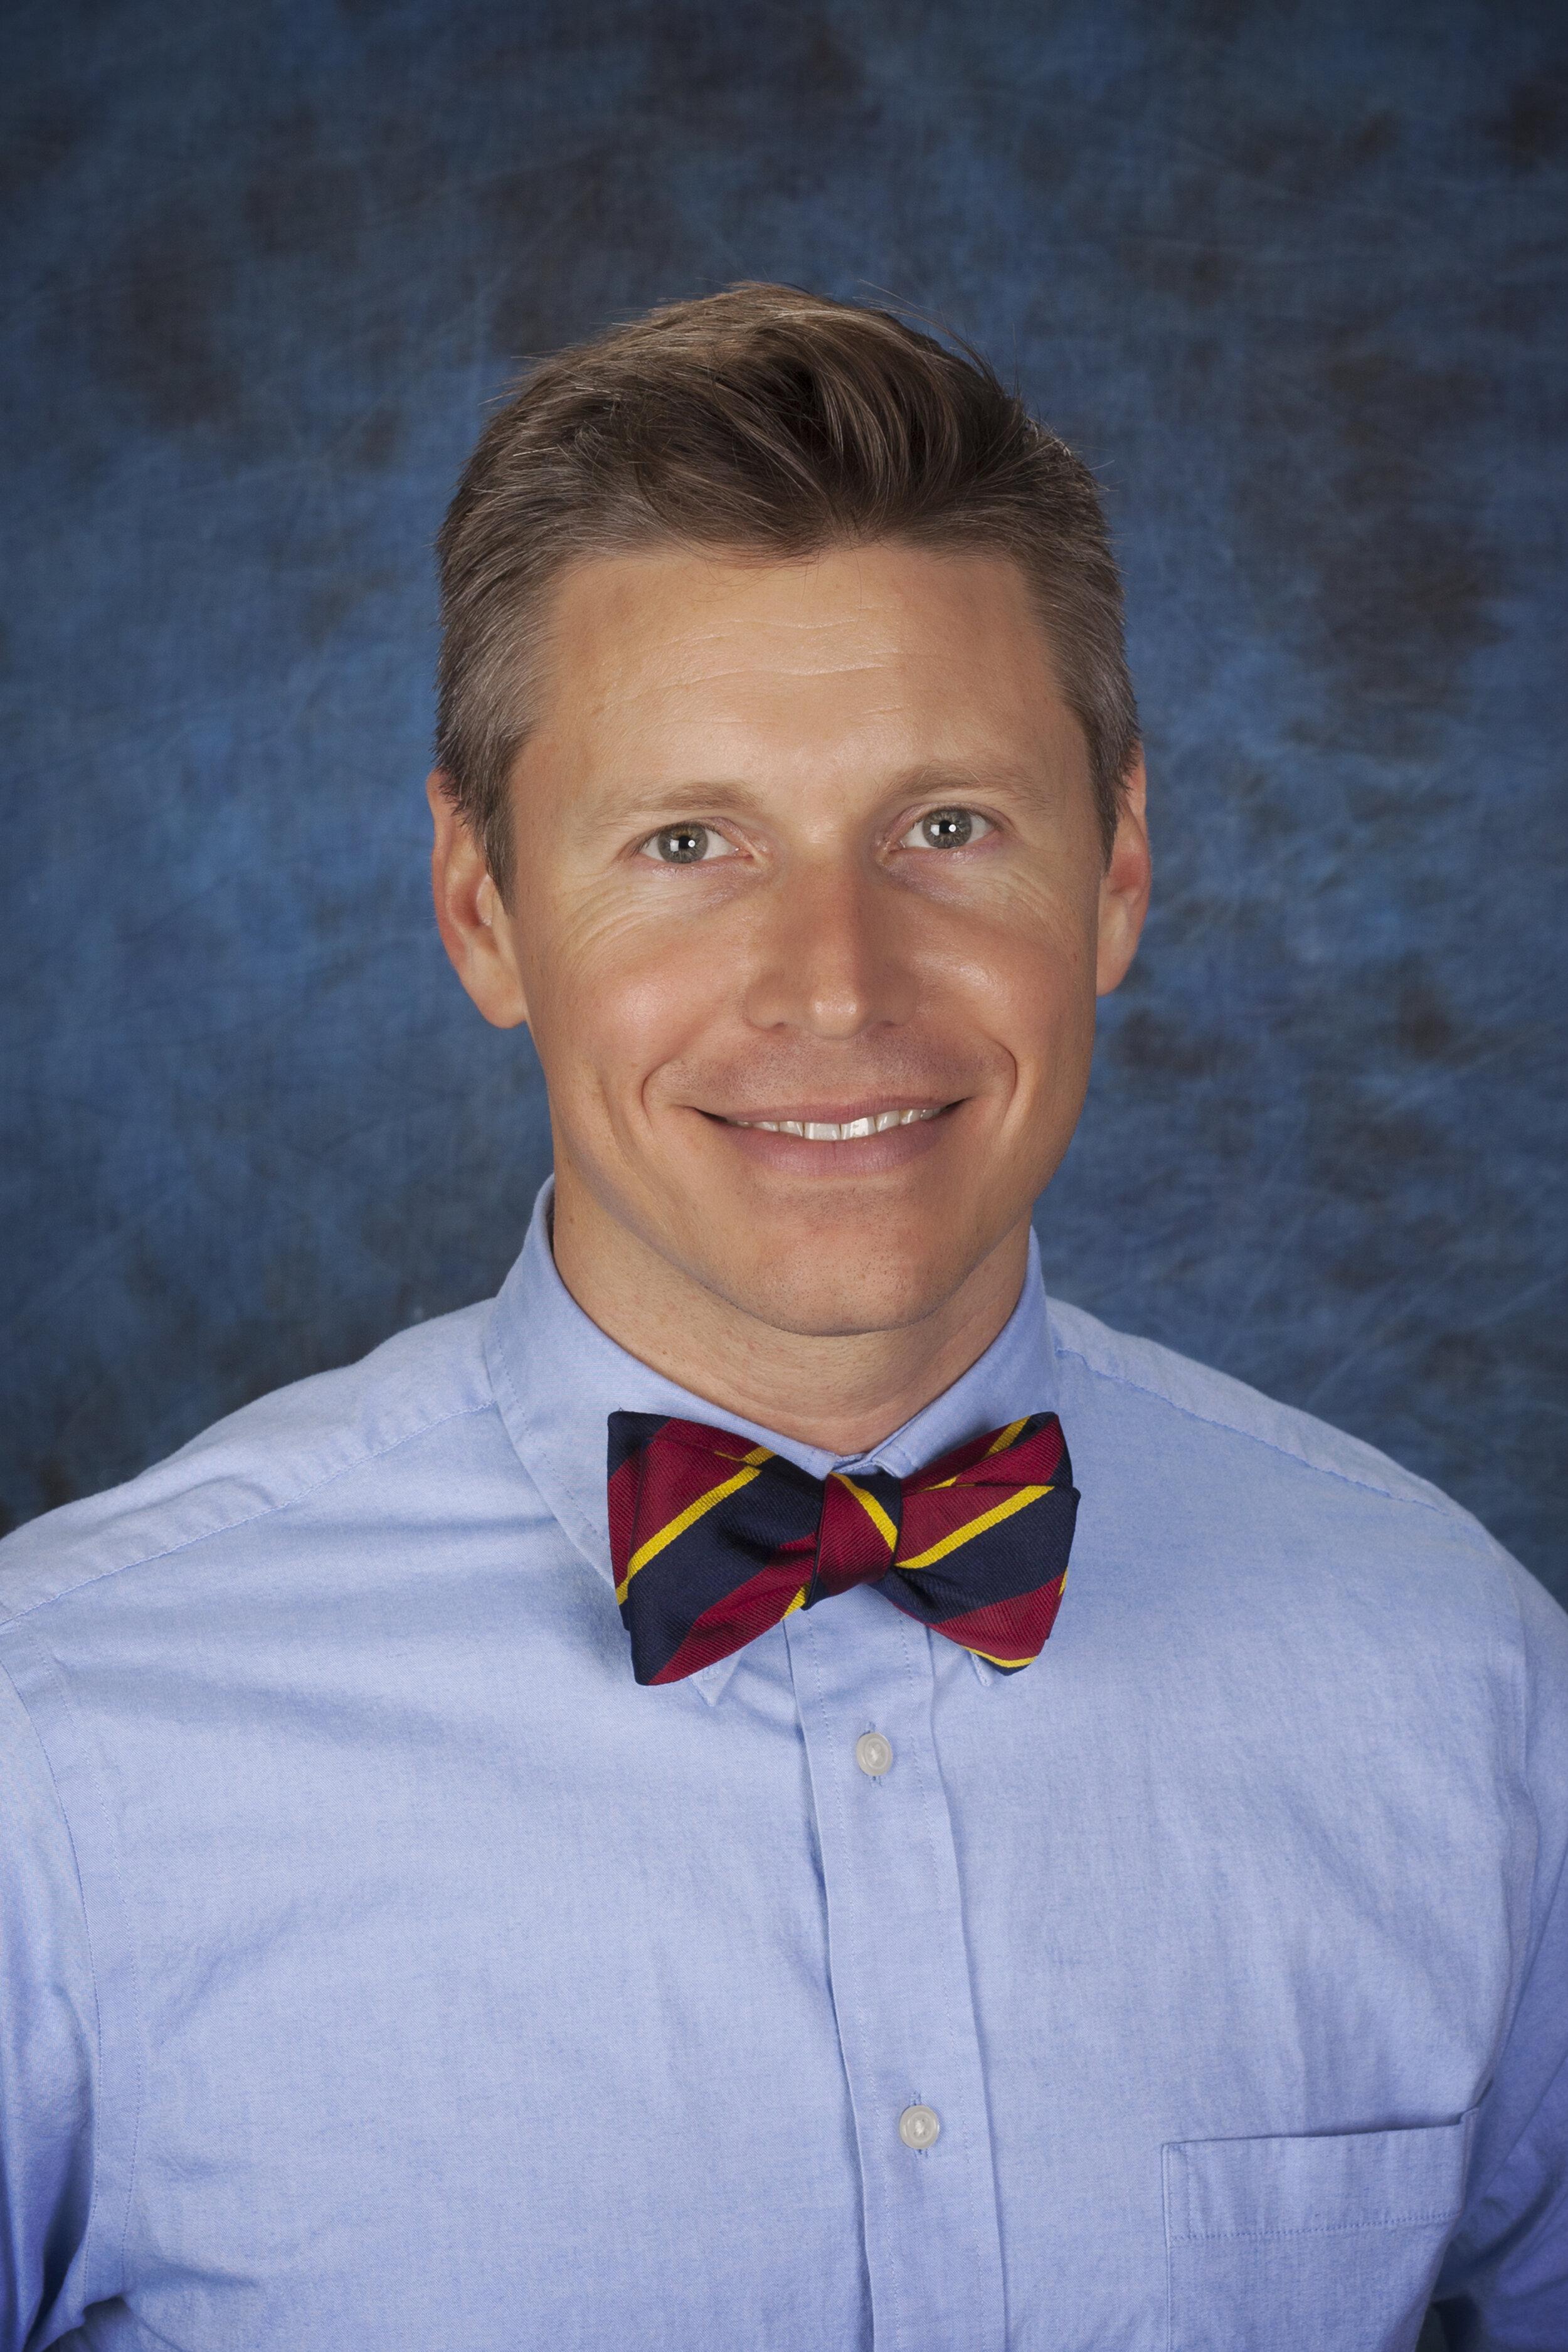 Joshua Eller - Dean of Students, Philosophy, Govt., Economics, Bible